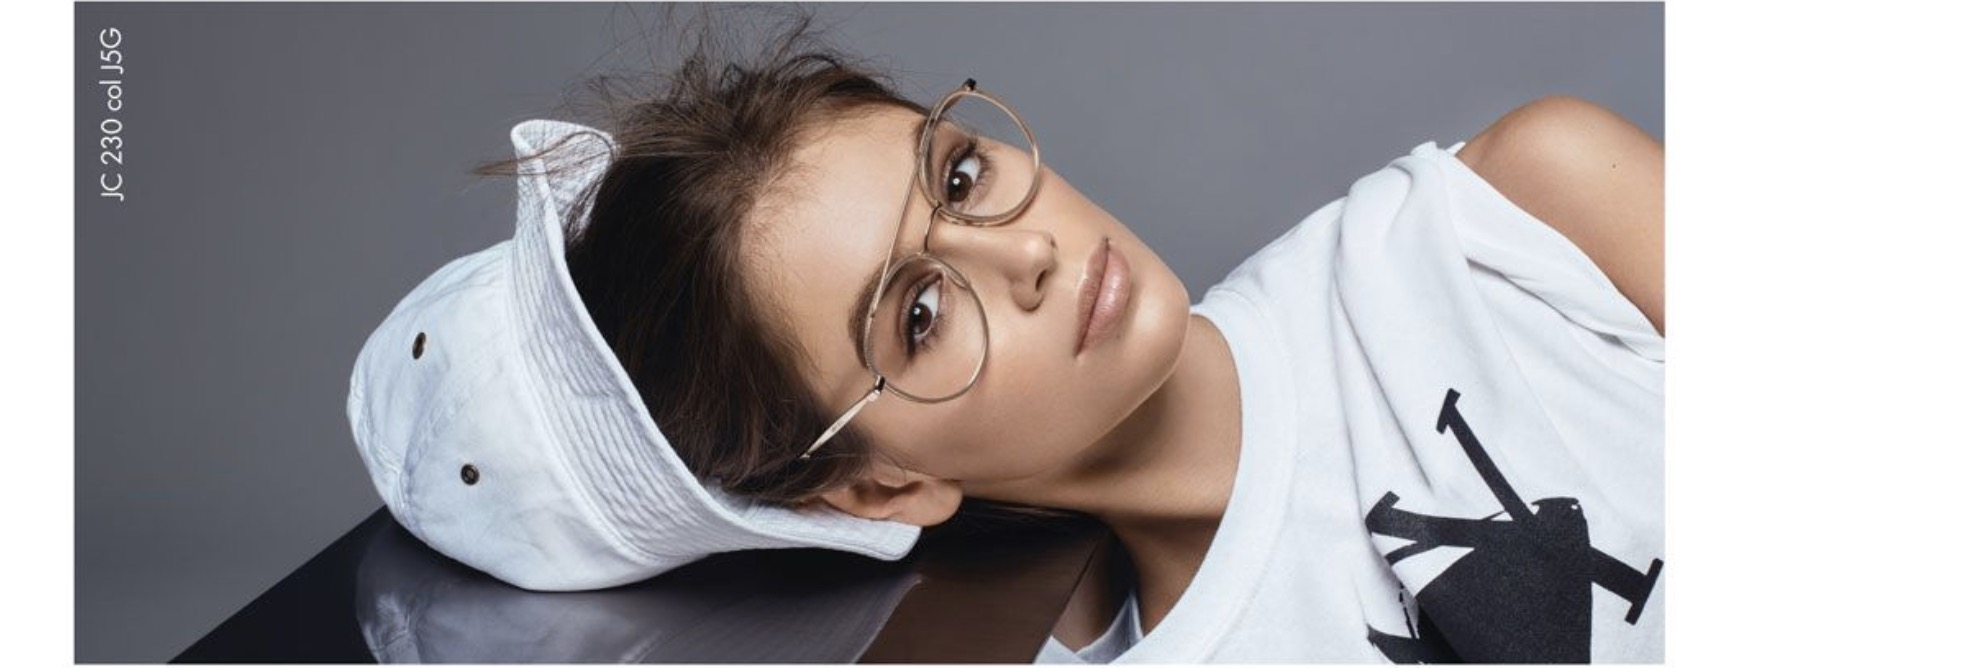 Women's Retro Glasses